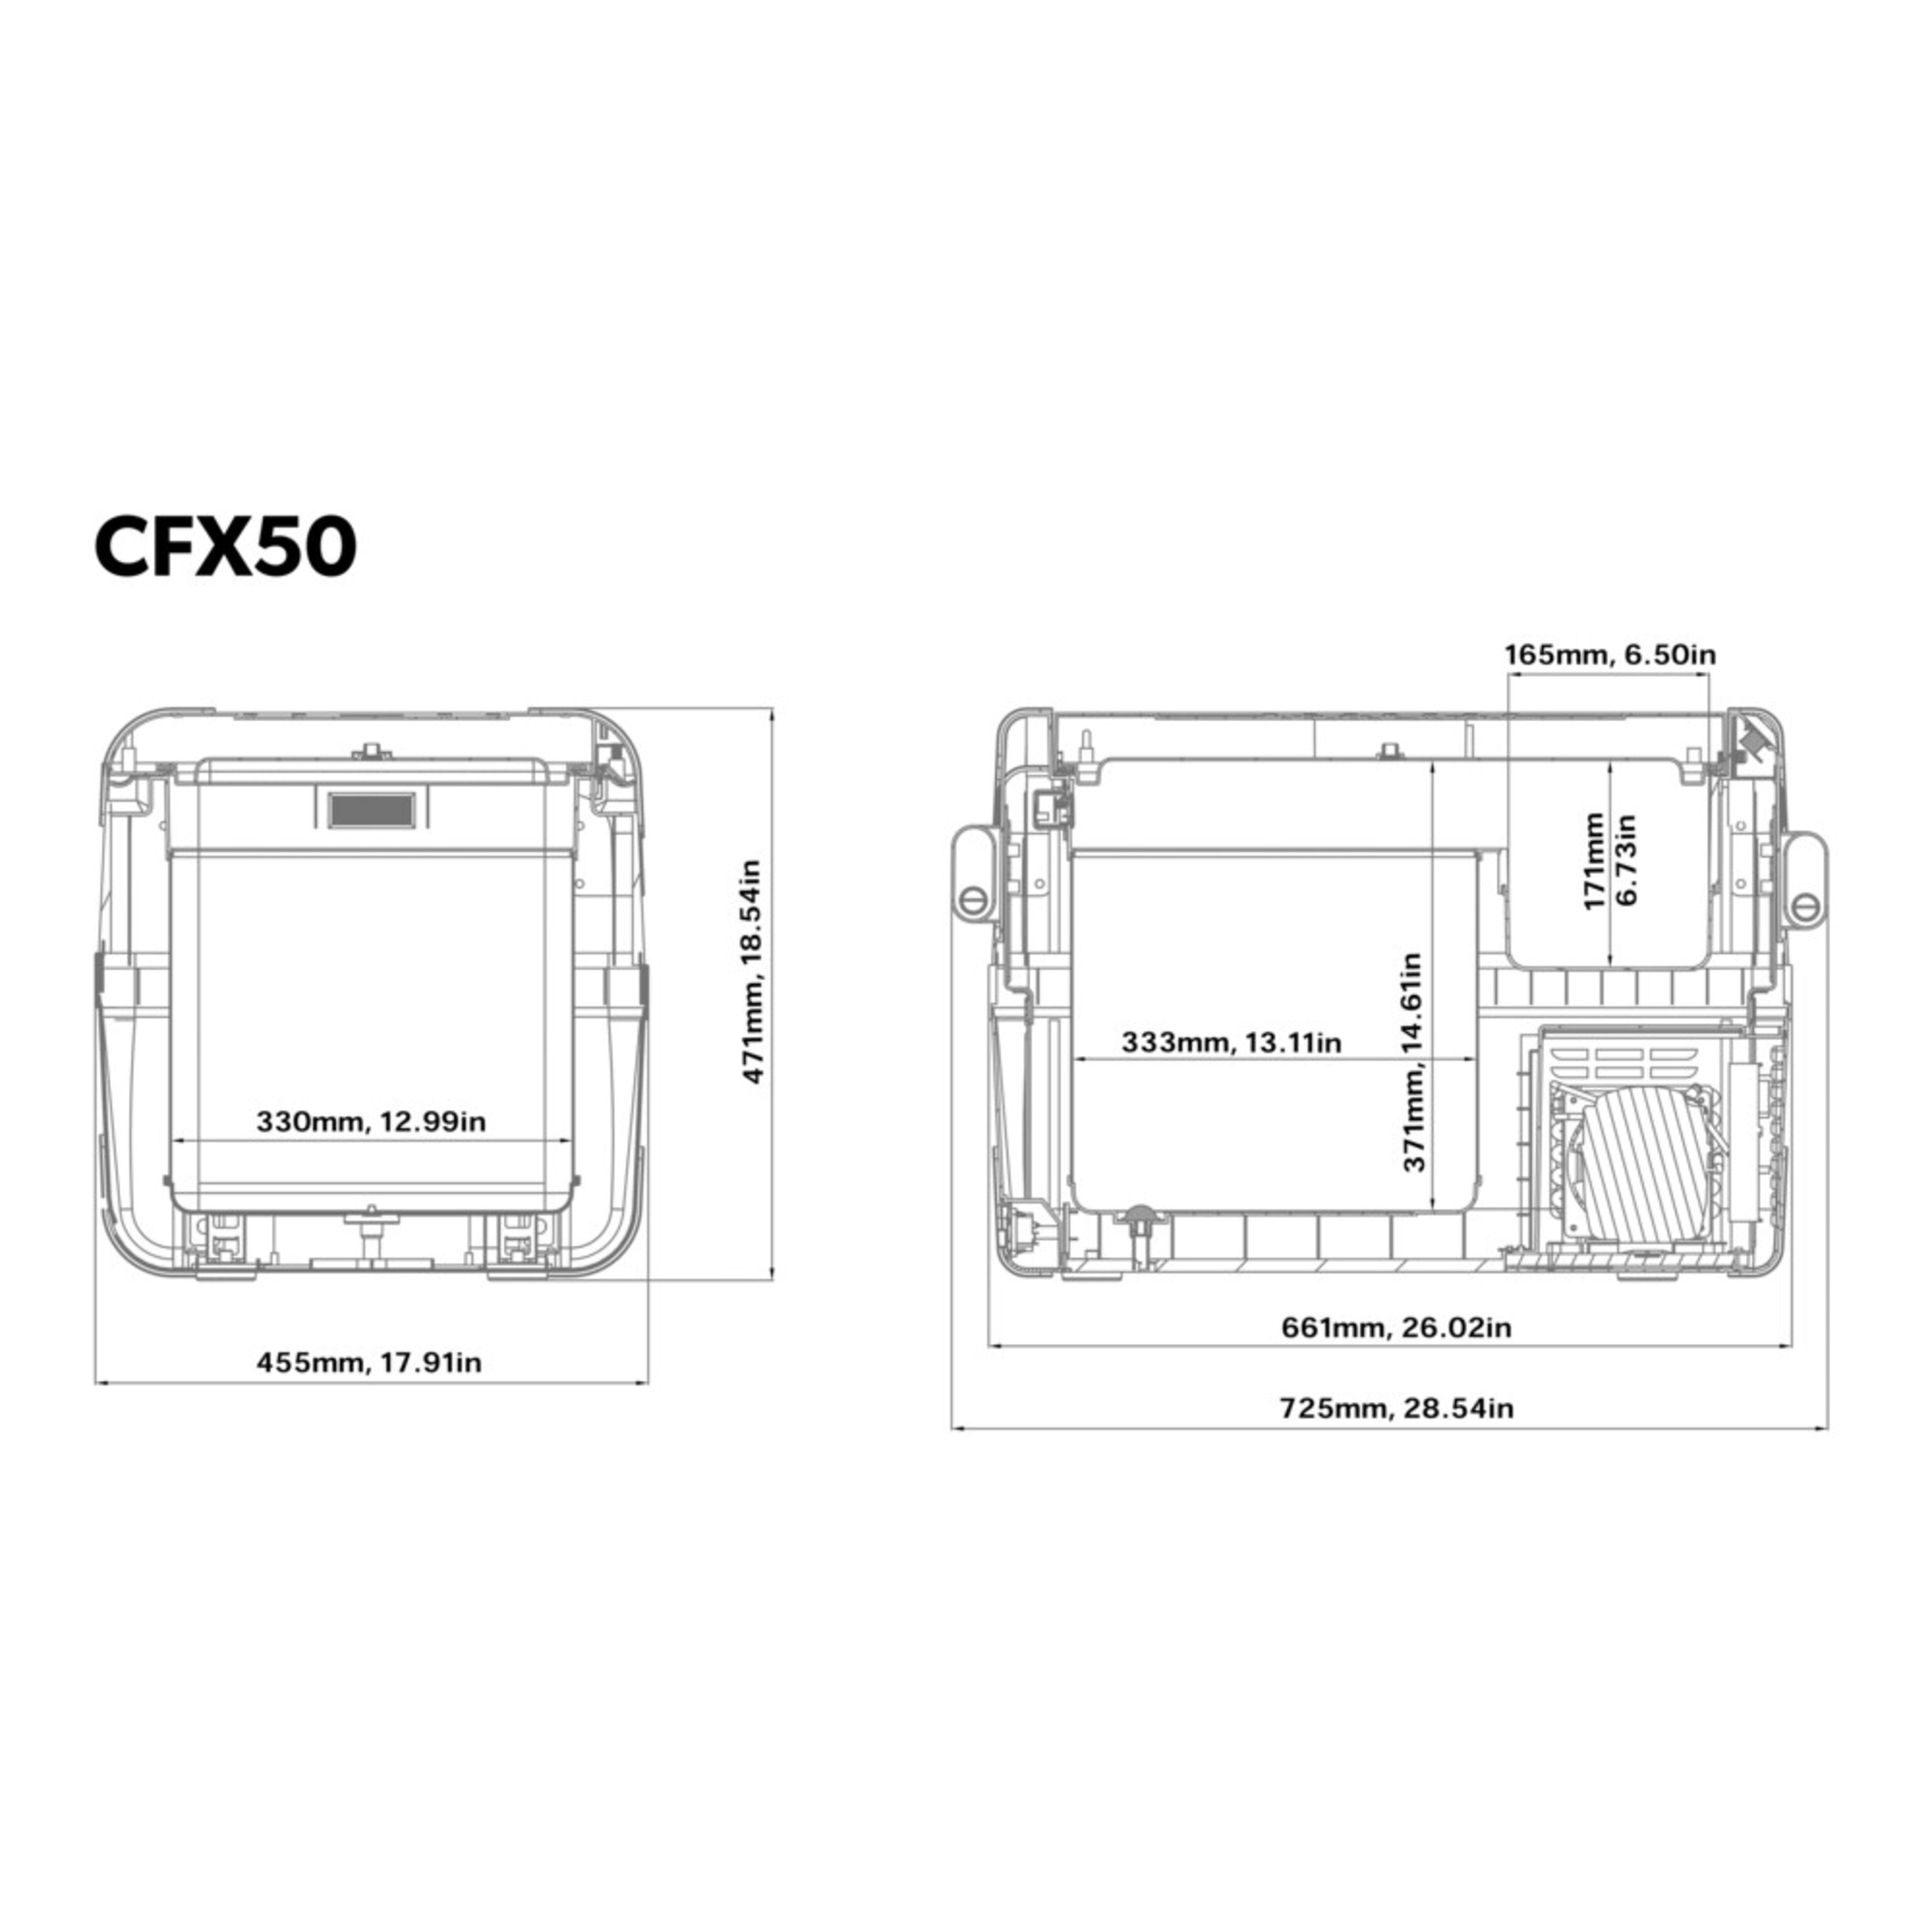 medium resolution of cfx 50w dimensions